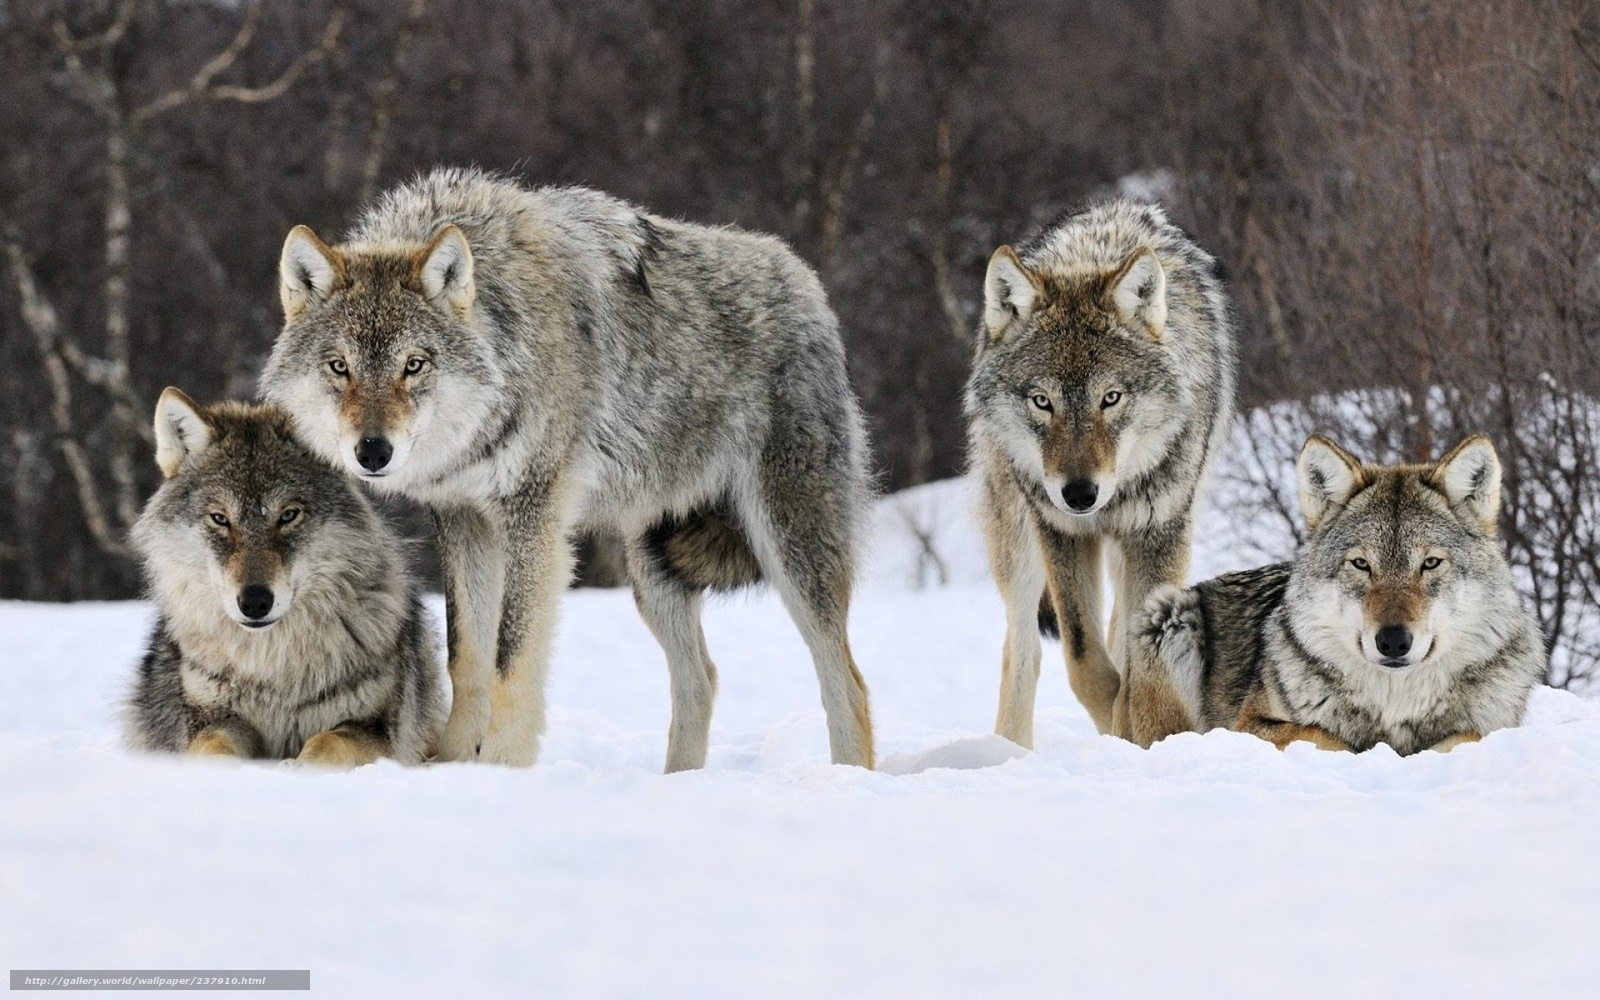 Картинка волки целуются - 7427